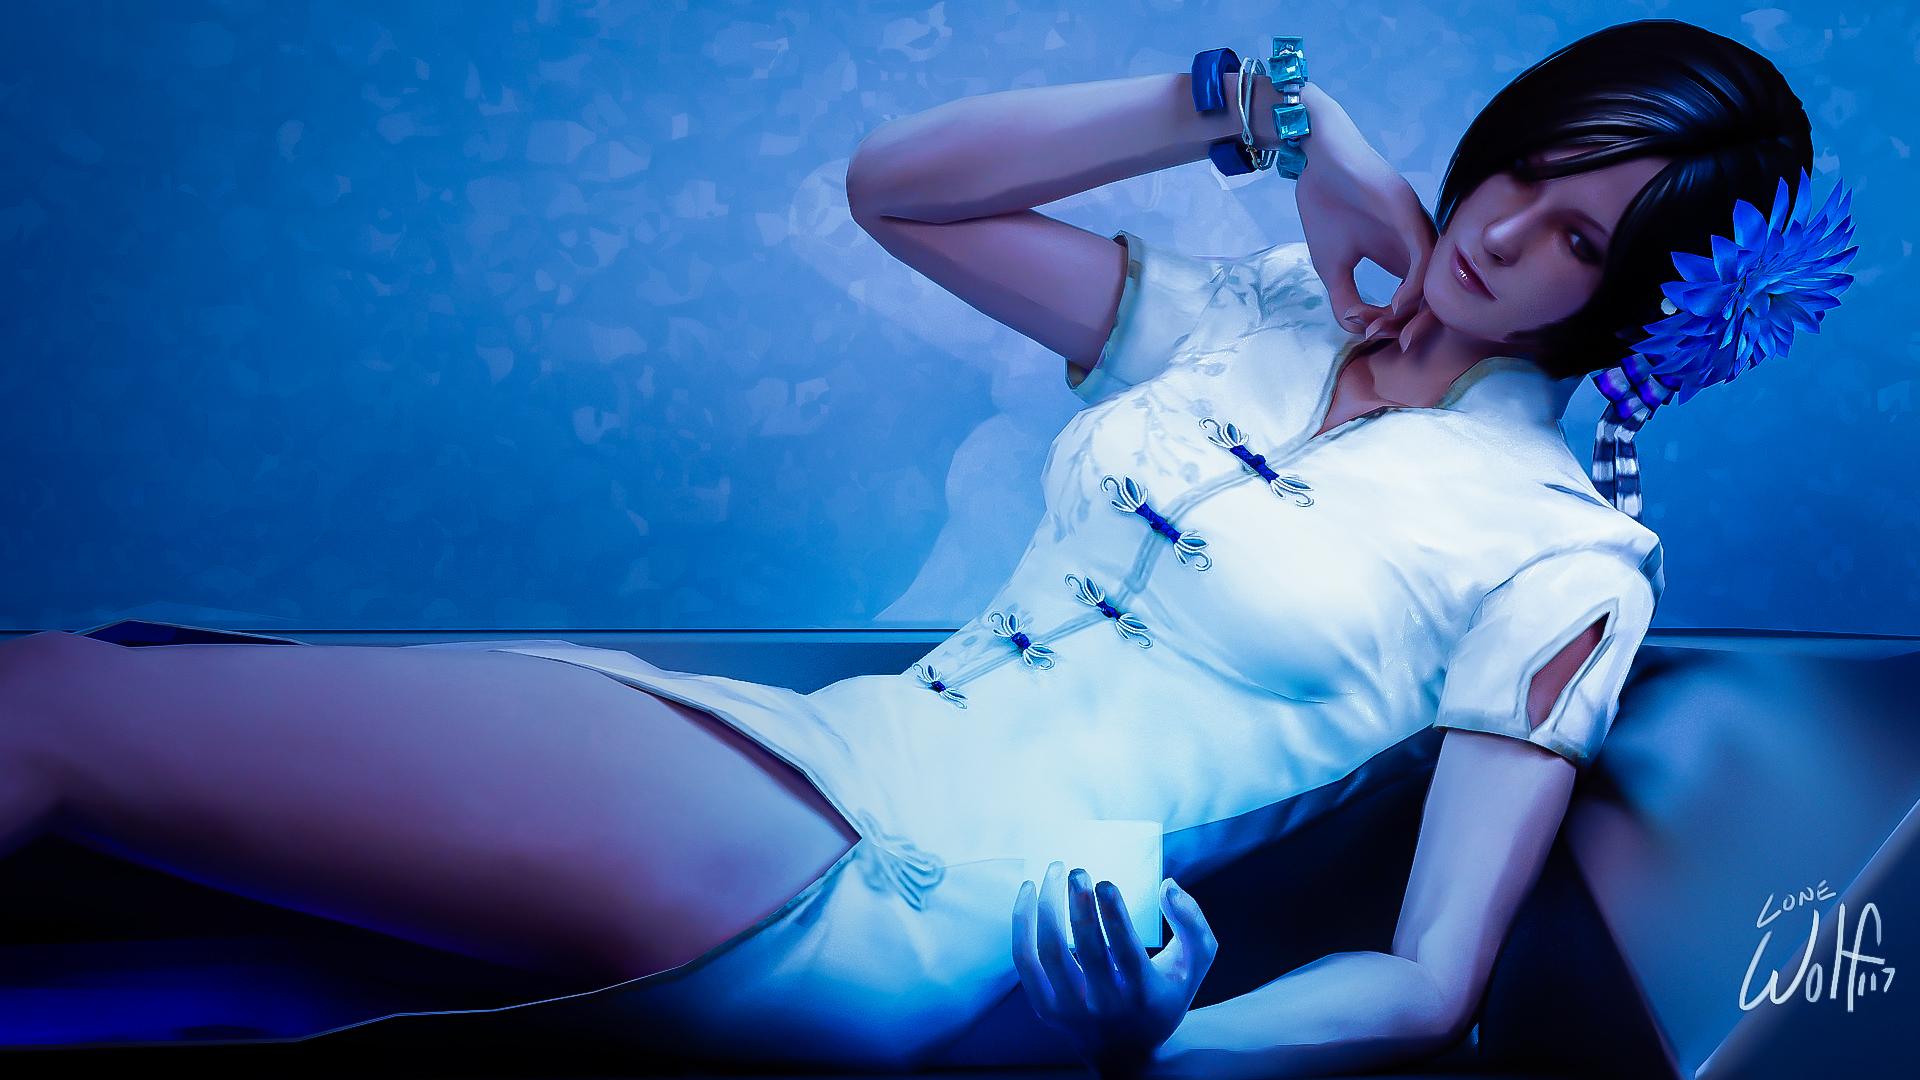 ada_wong__a_glass_butterfly_by_lonewolf117-d65jlka (1).jpg - -